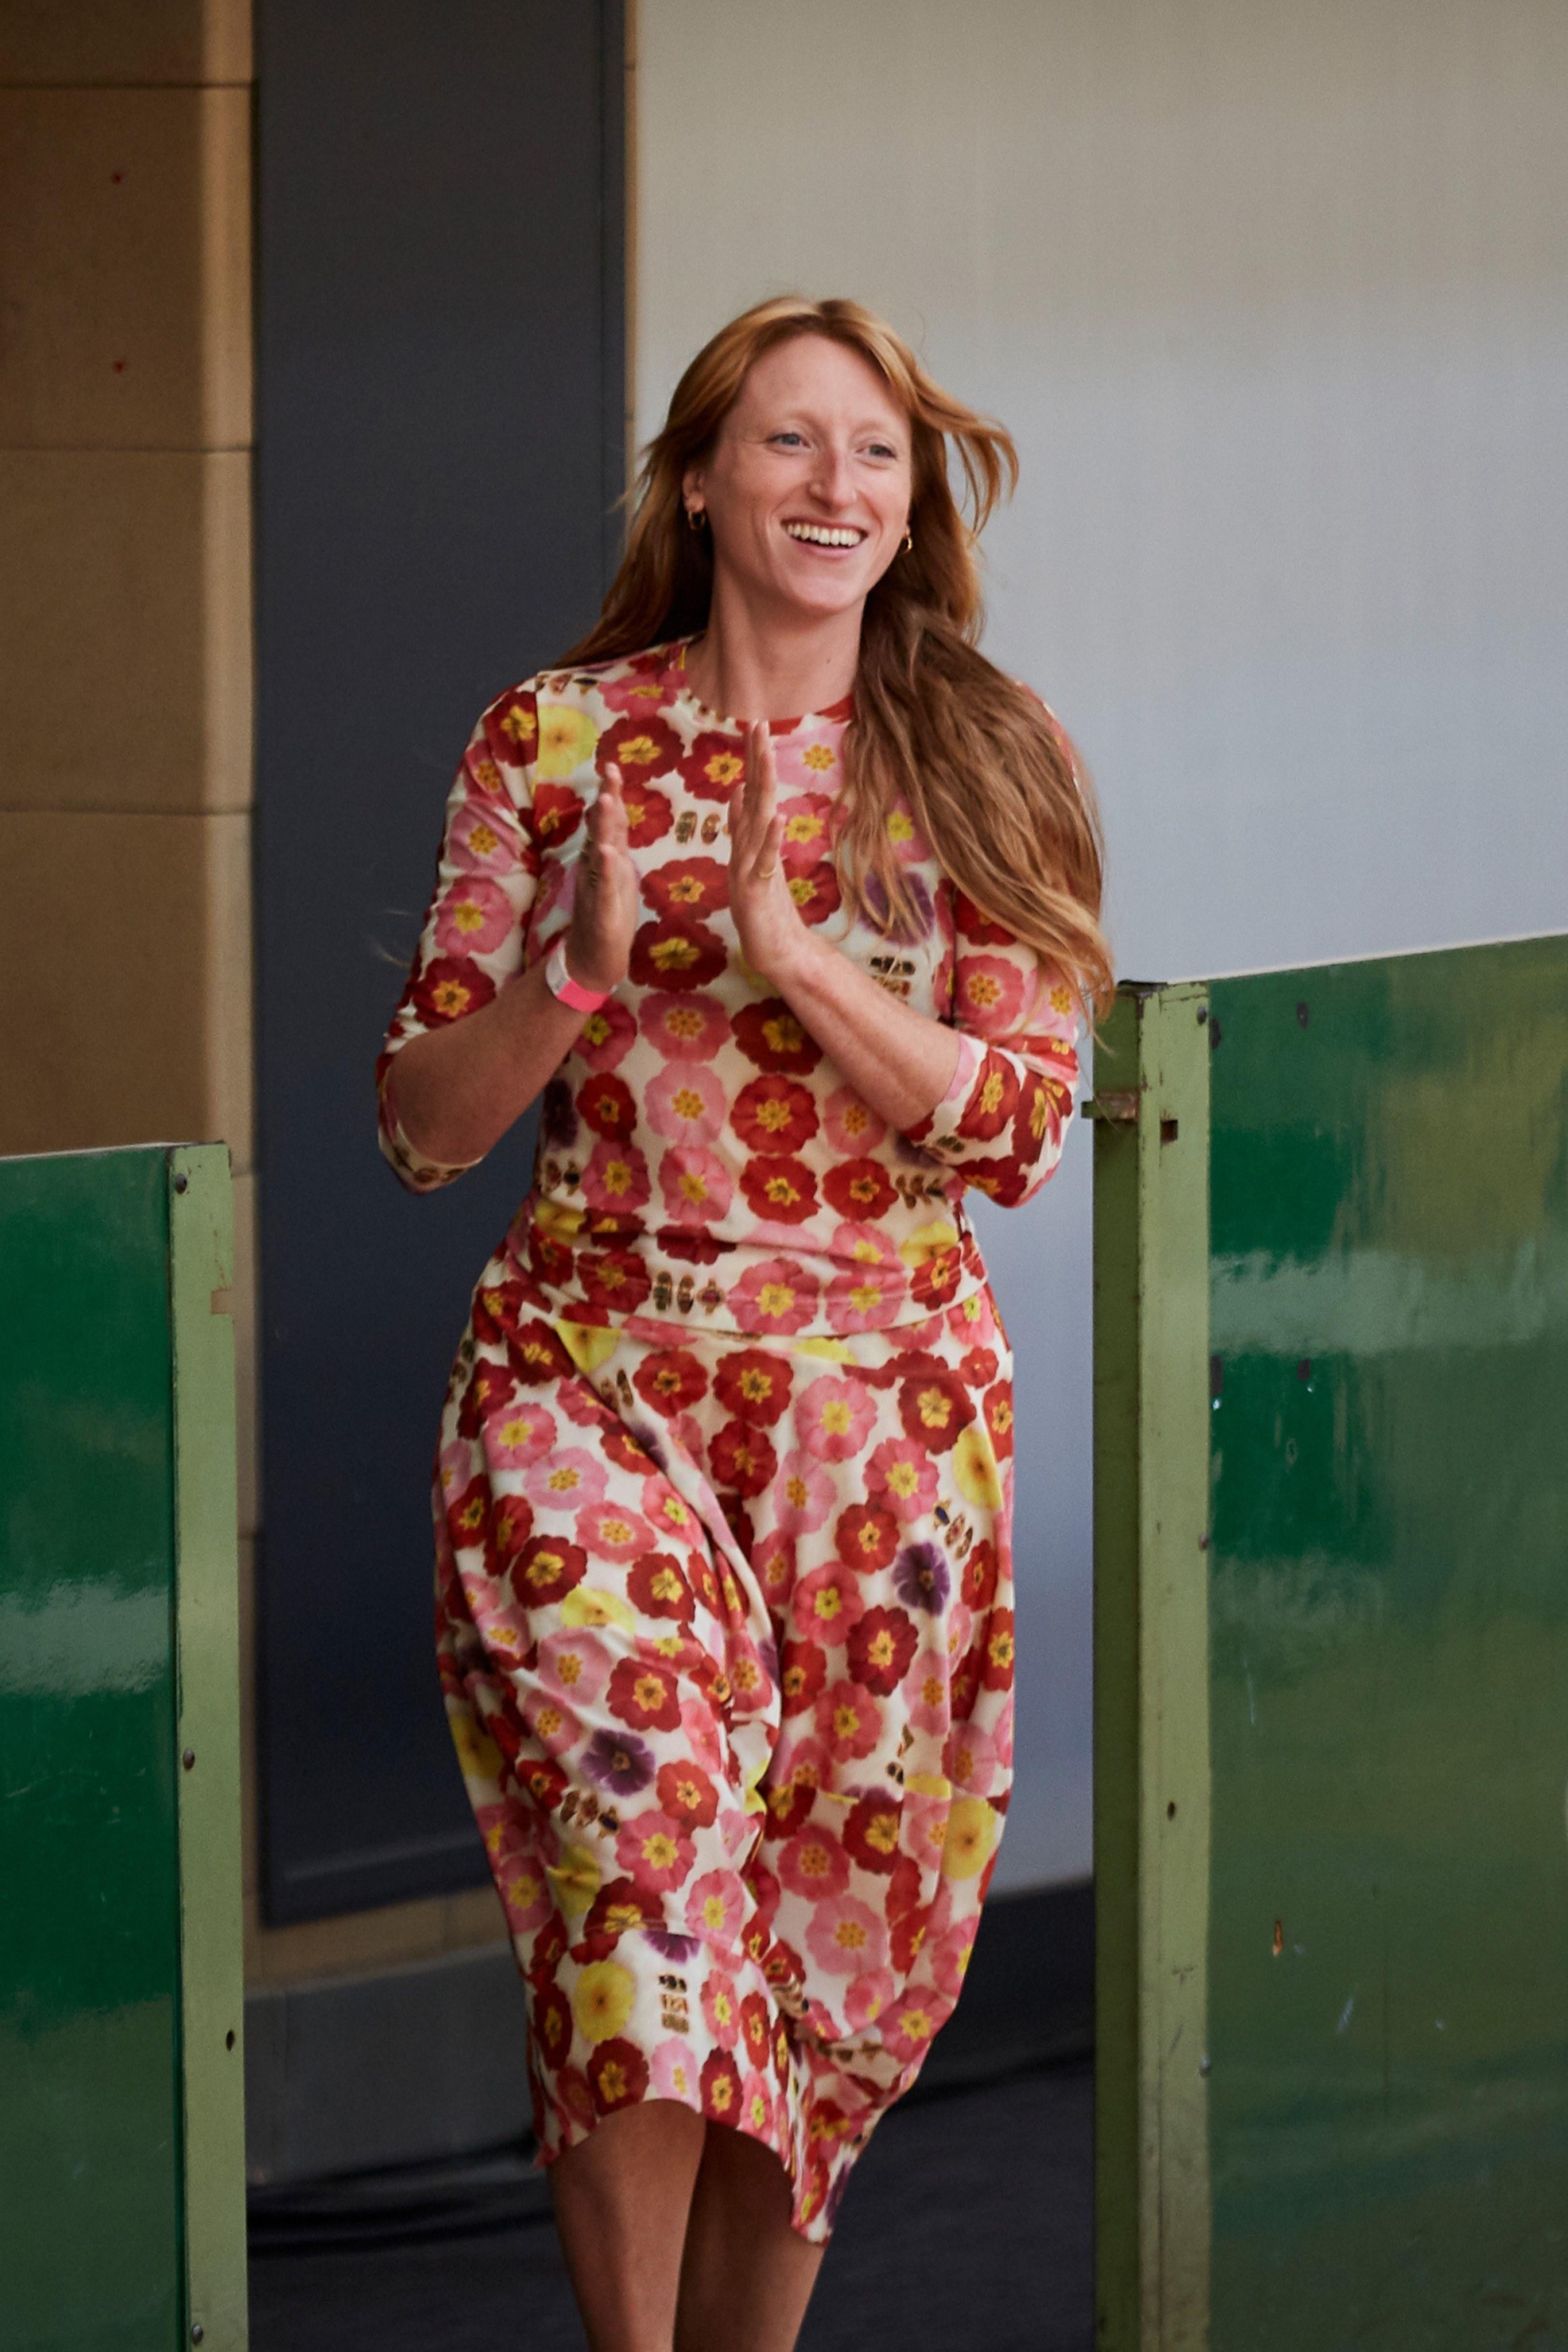 Molly Goddard Spring Summer 2020 At London Fashion Week Video 2019 Imdb